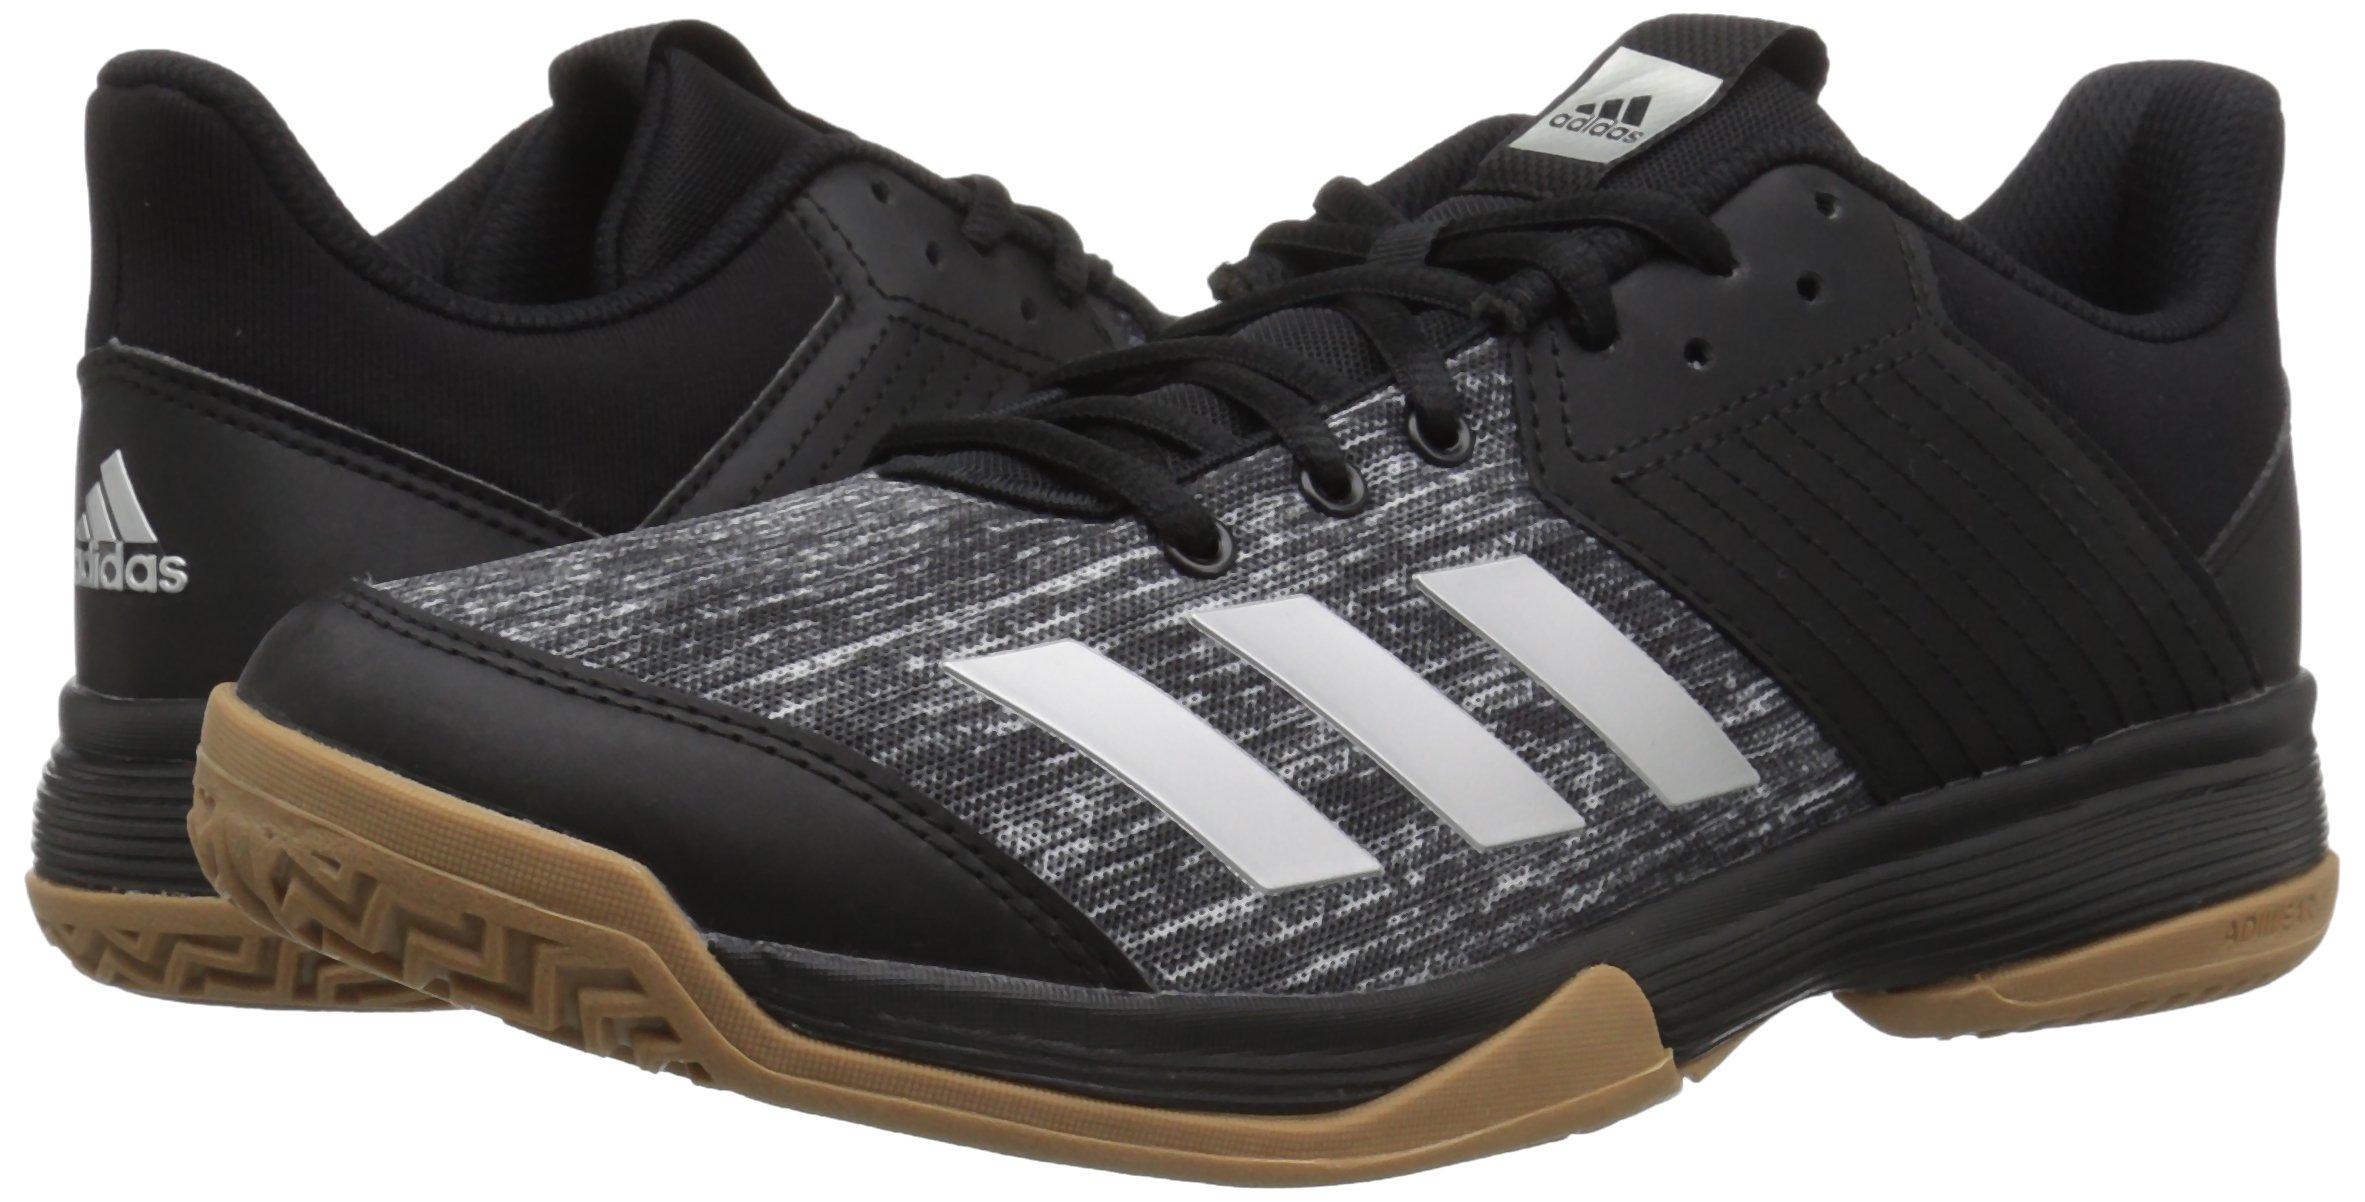 adidas Women's Ligra 6 Volleyball Shoe, Black/Silver Metallic/White, 7 M US by adidas (Image #5)